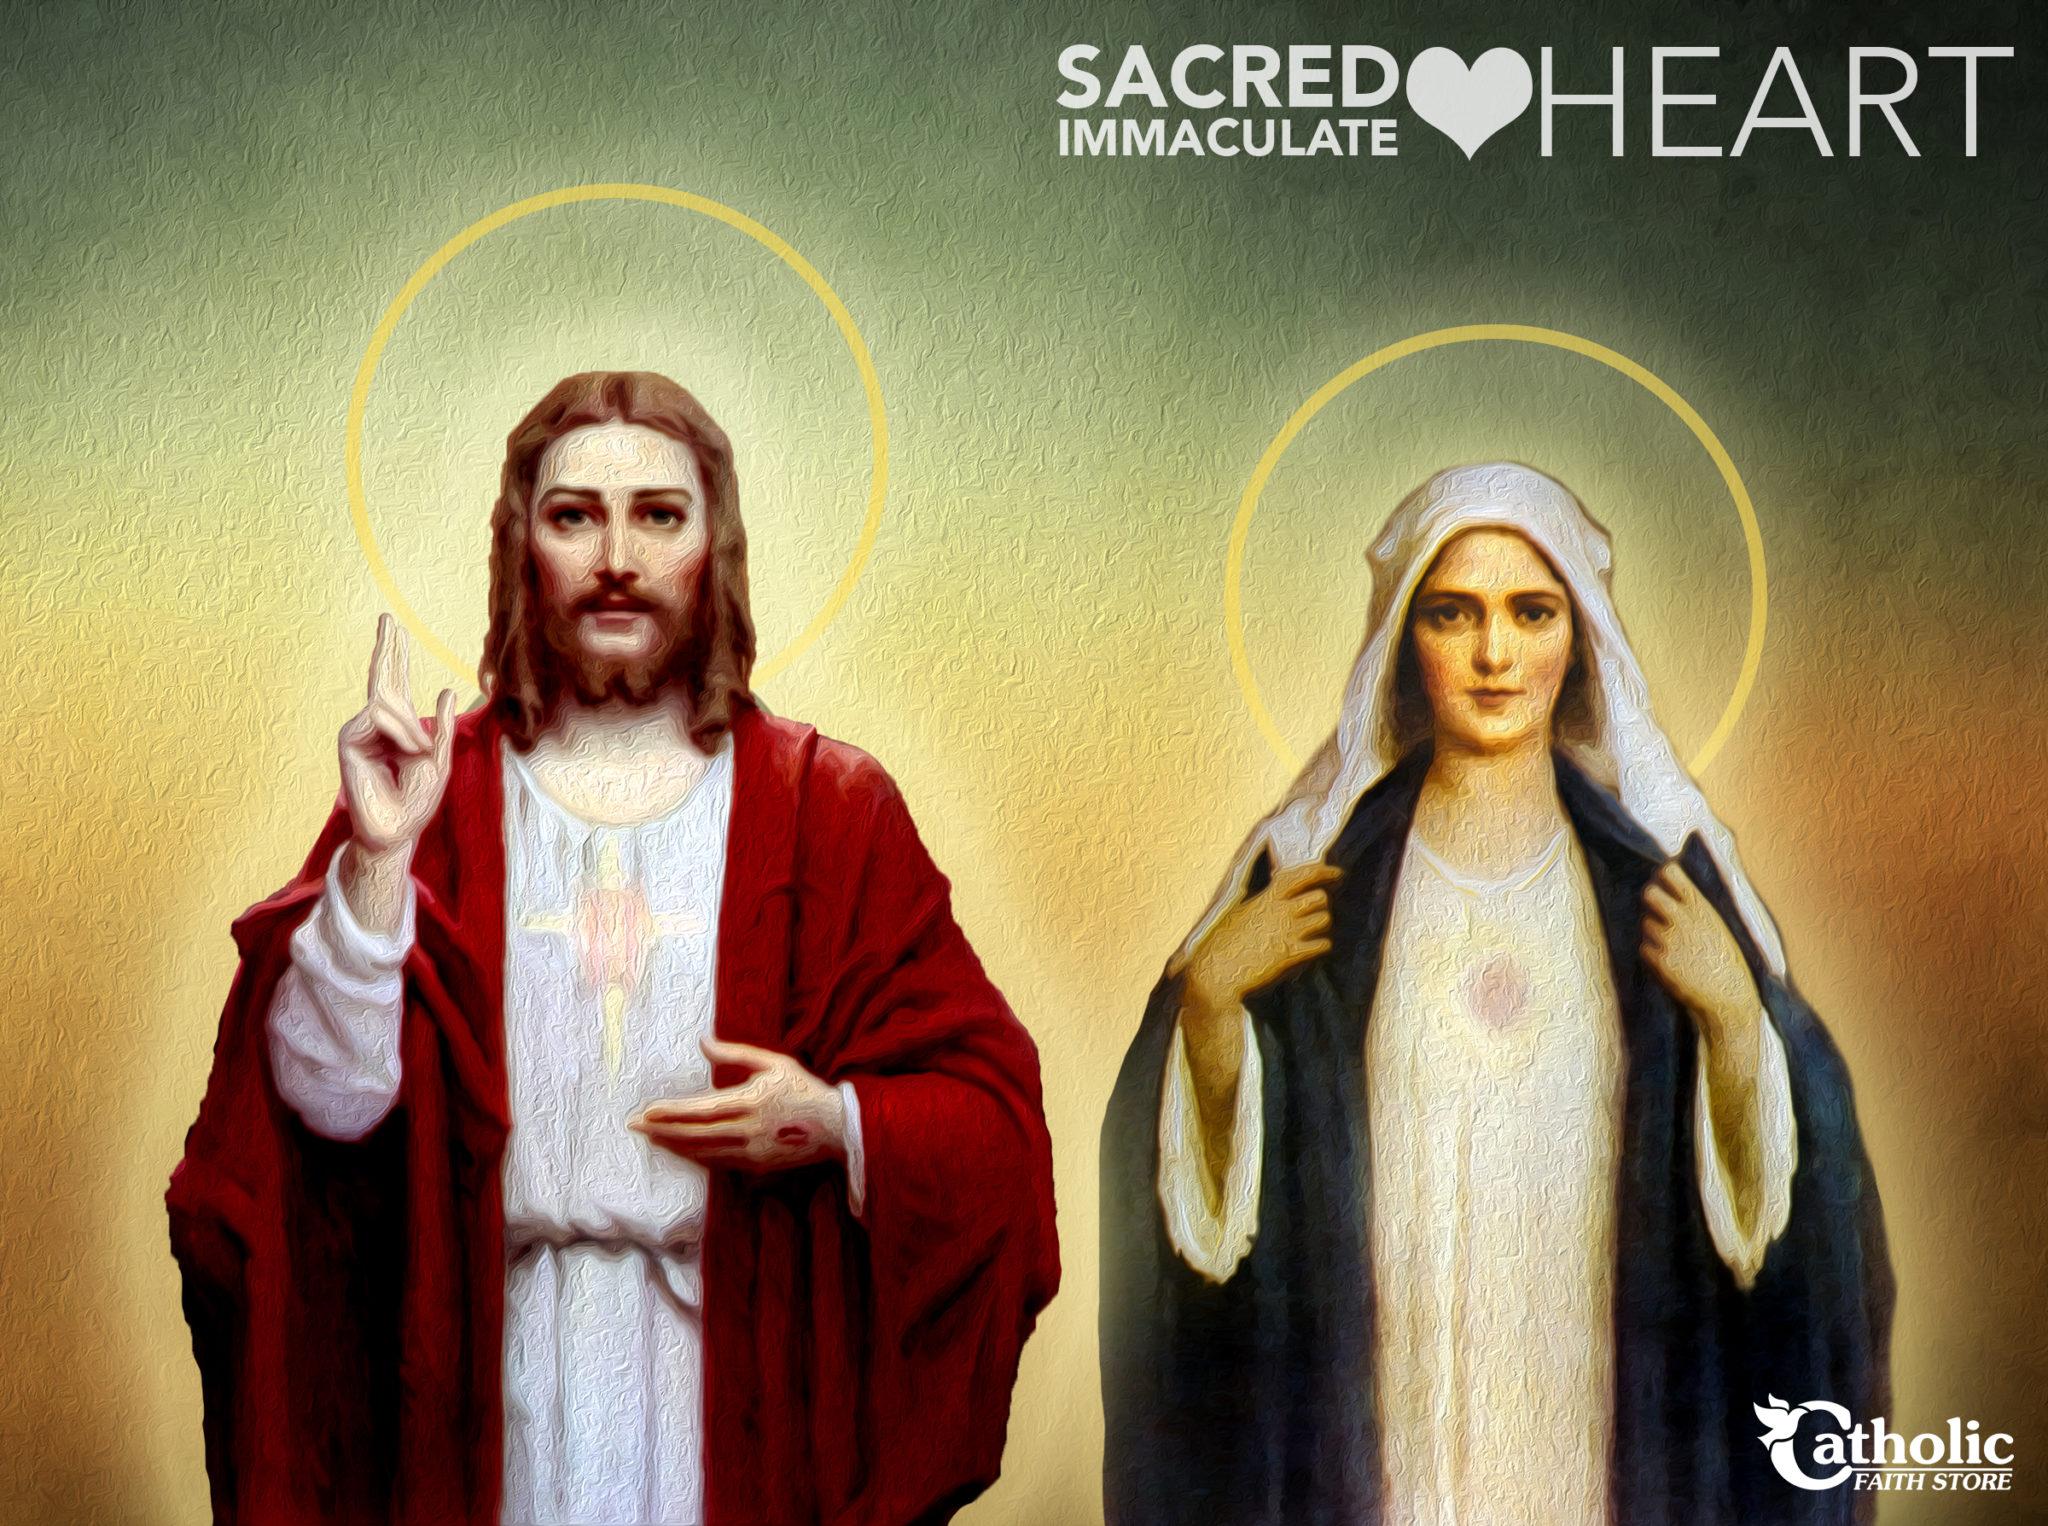 Sacred Heart — Immaculate Heart